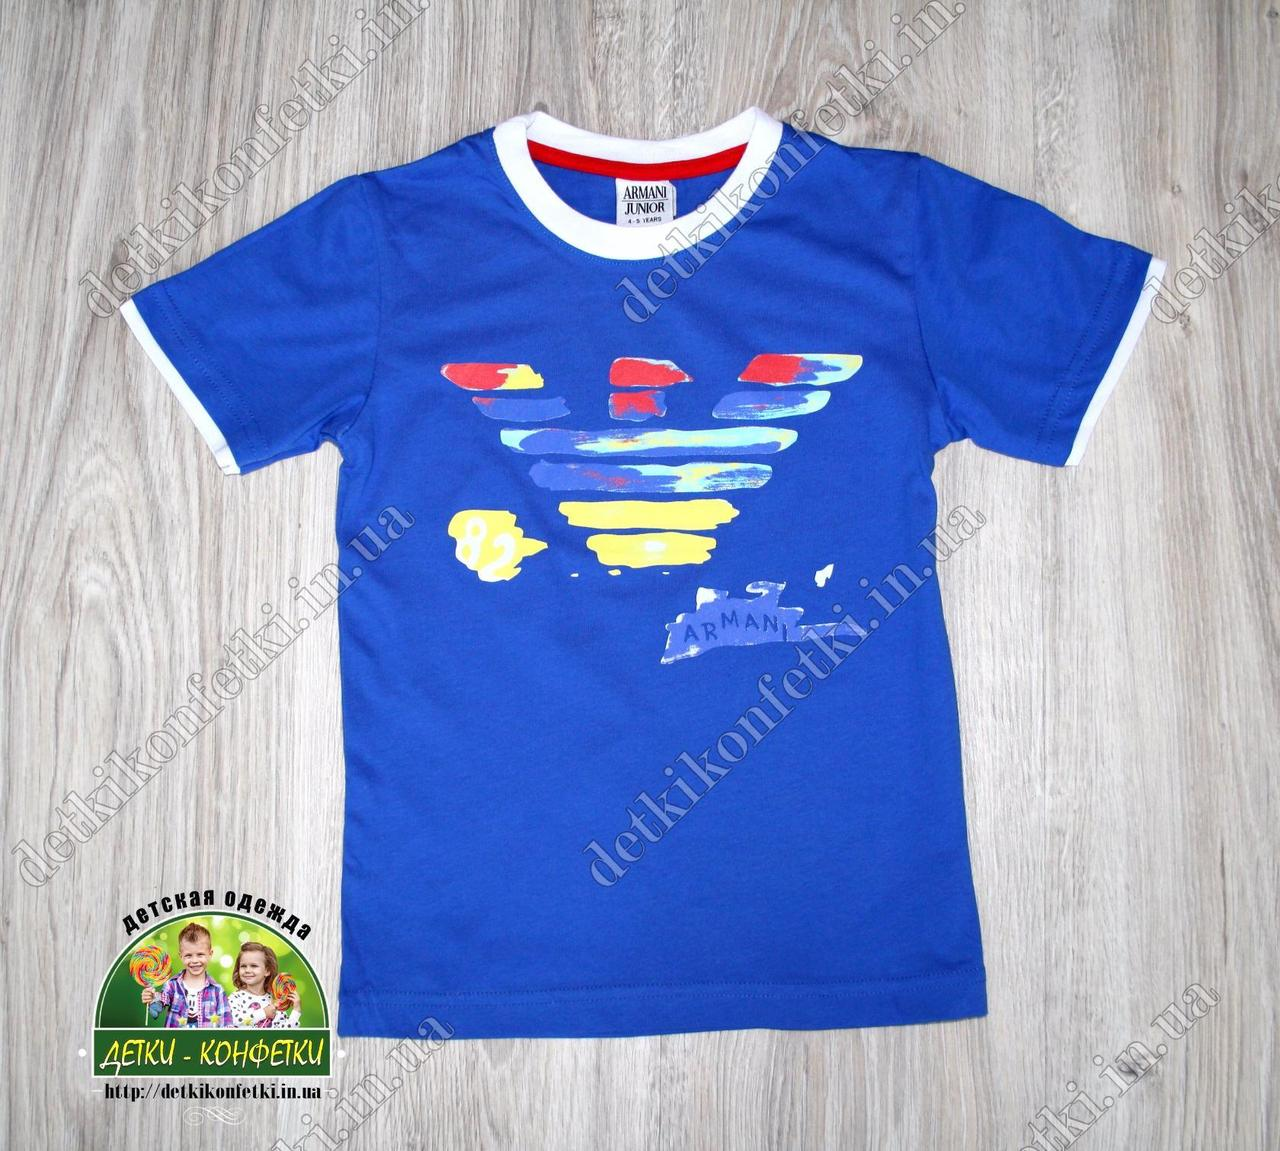 Купить Летняя футболка для мальчика Армани Armani электрик, Giorgio Armani